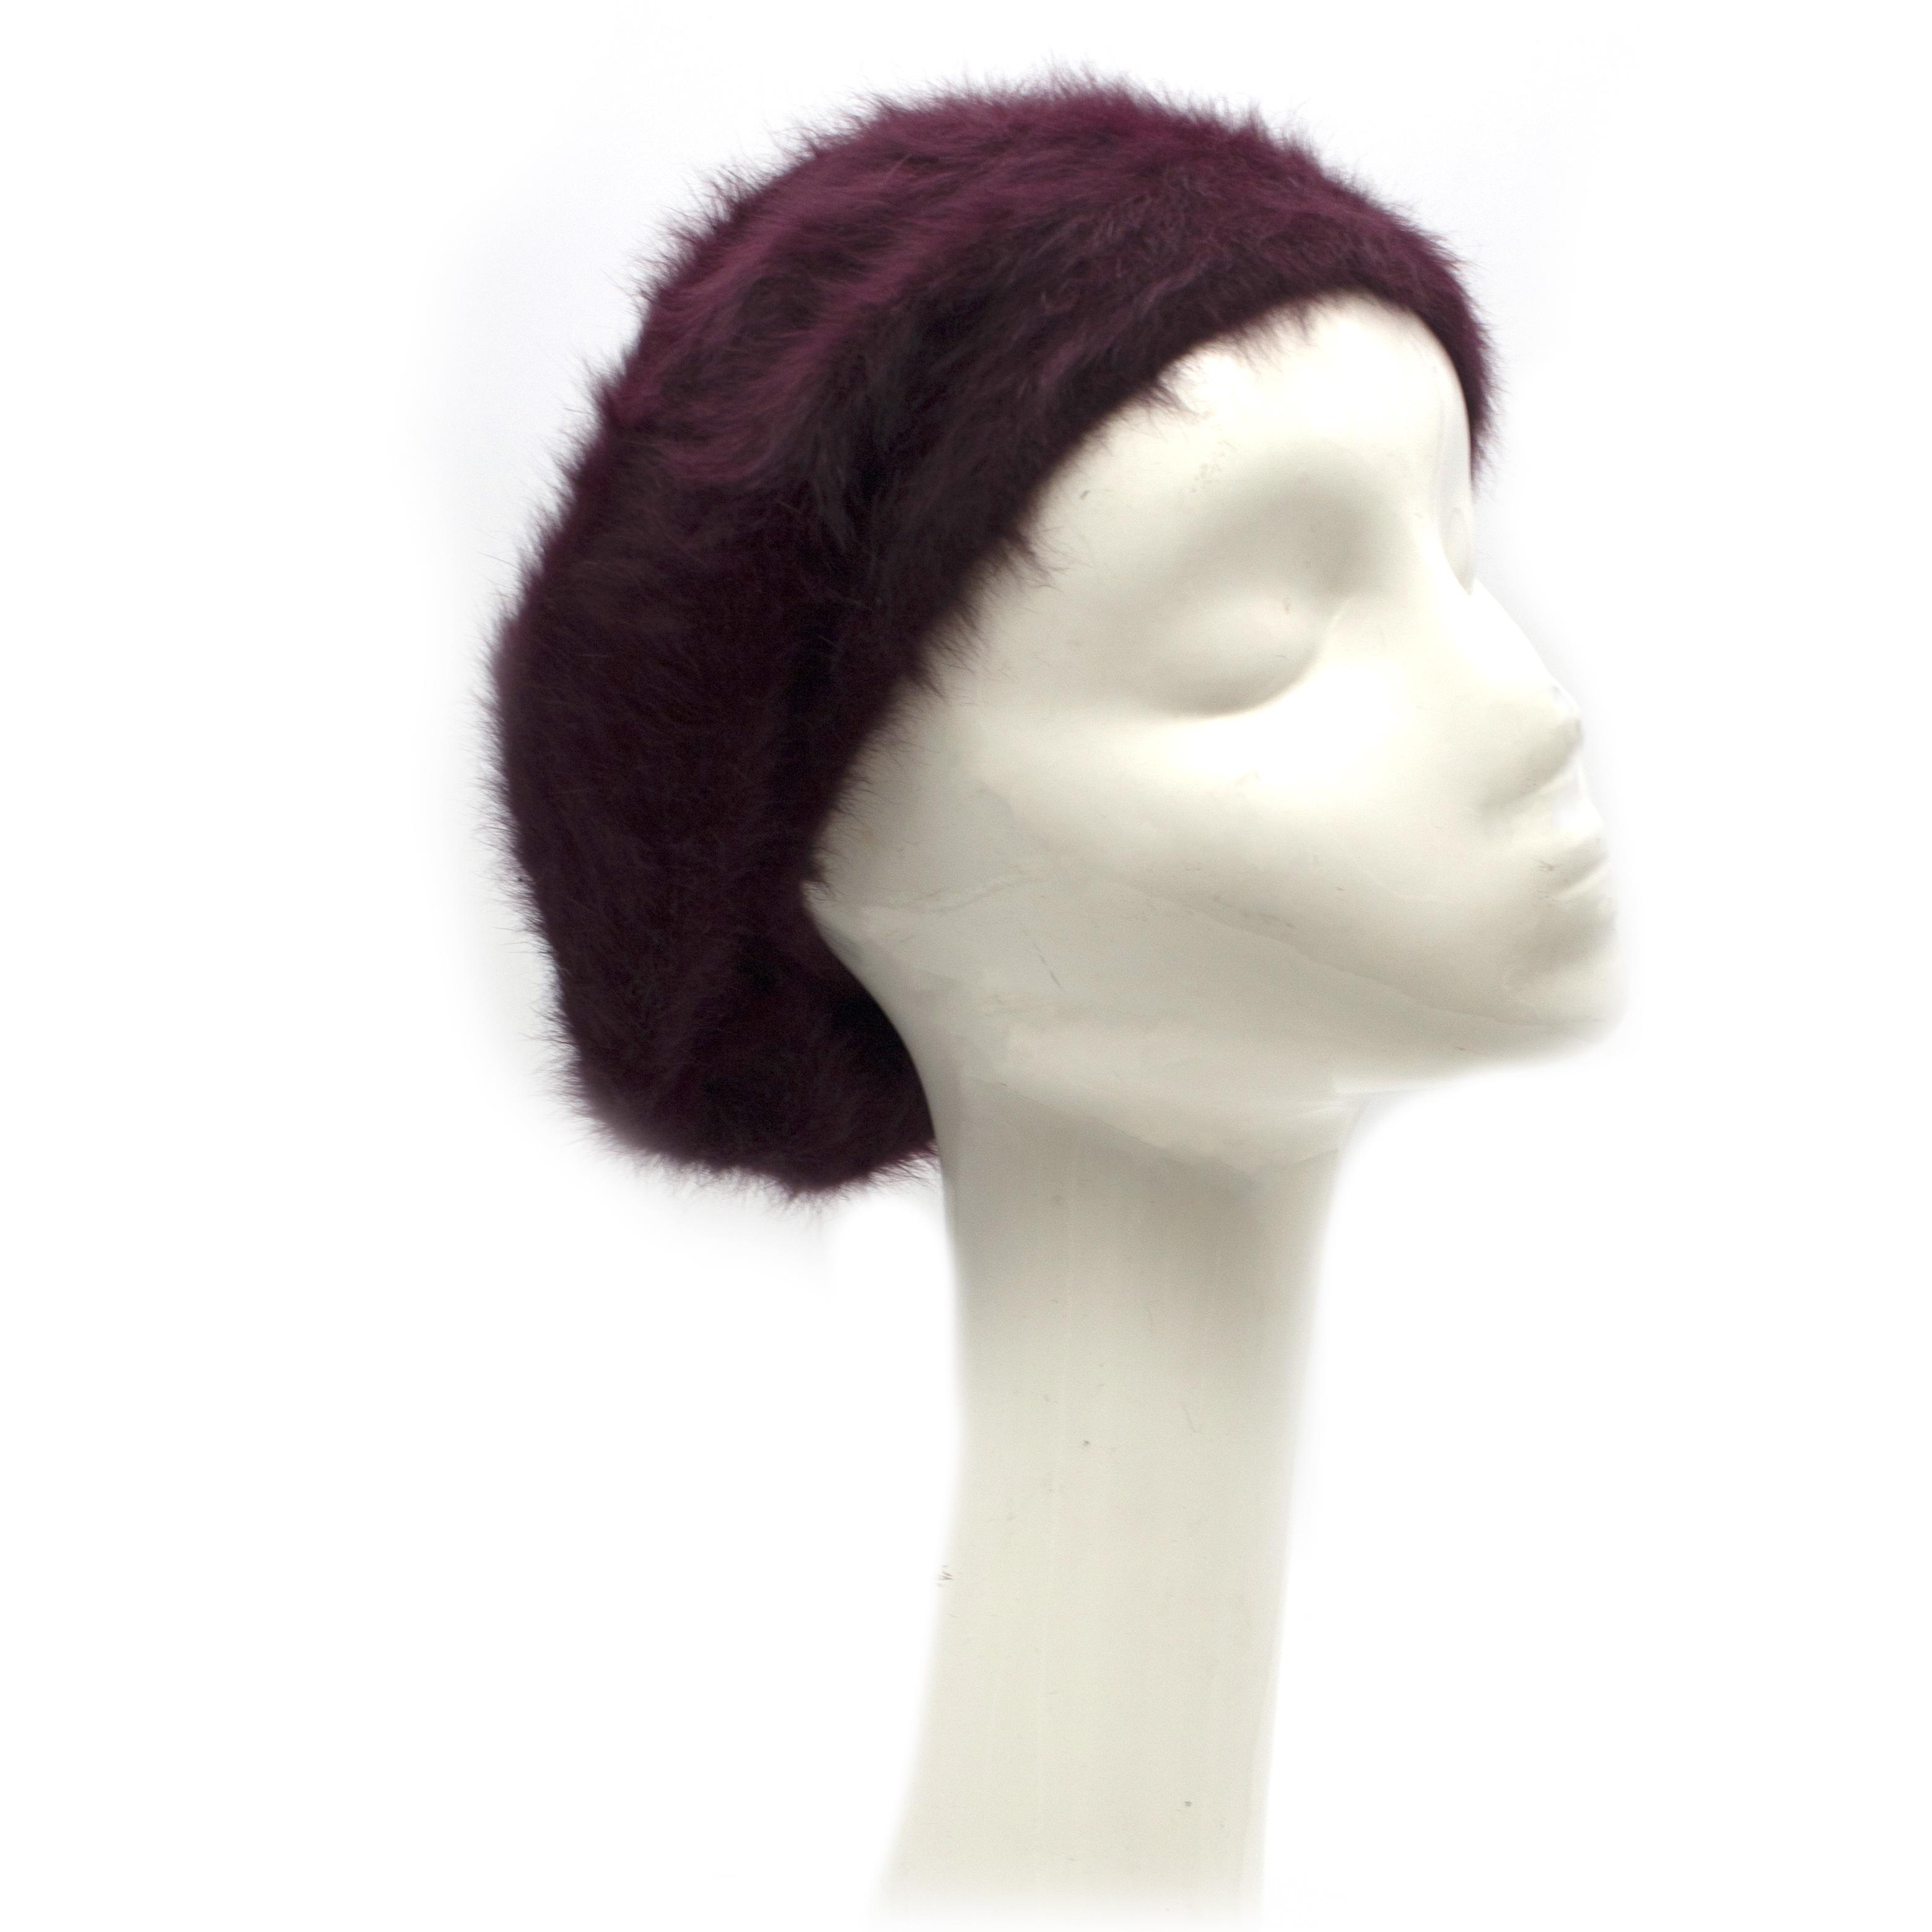 Paul Smith burgundy angora-blend beret